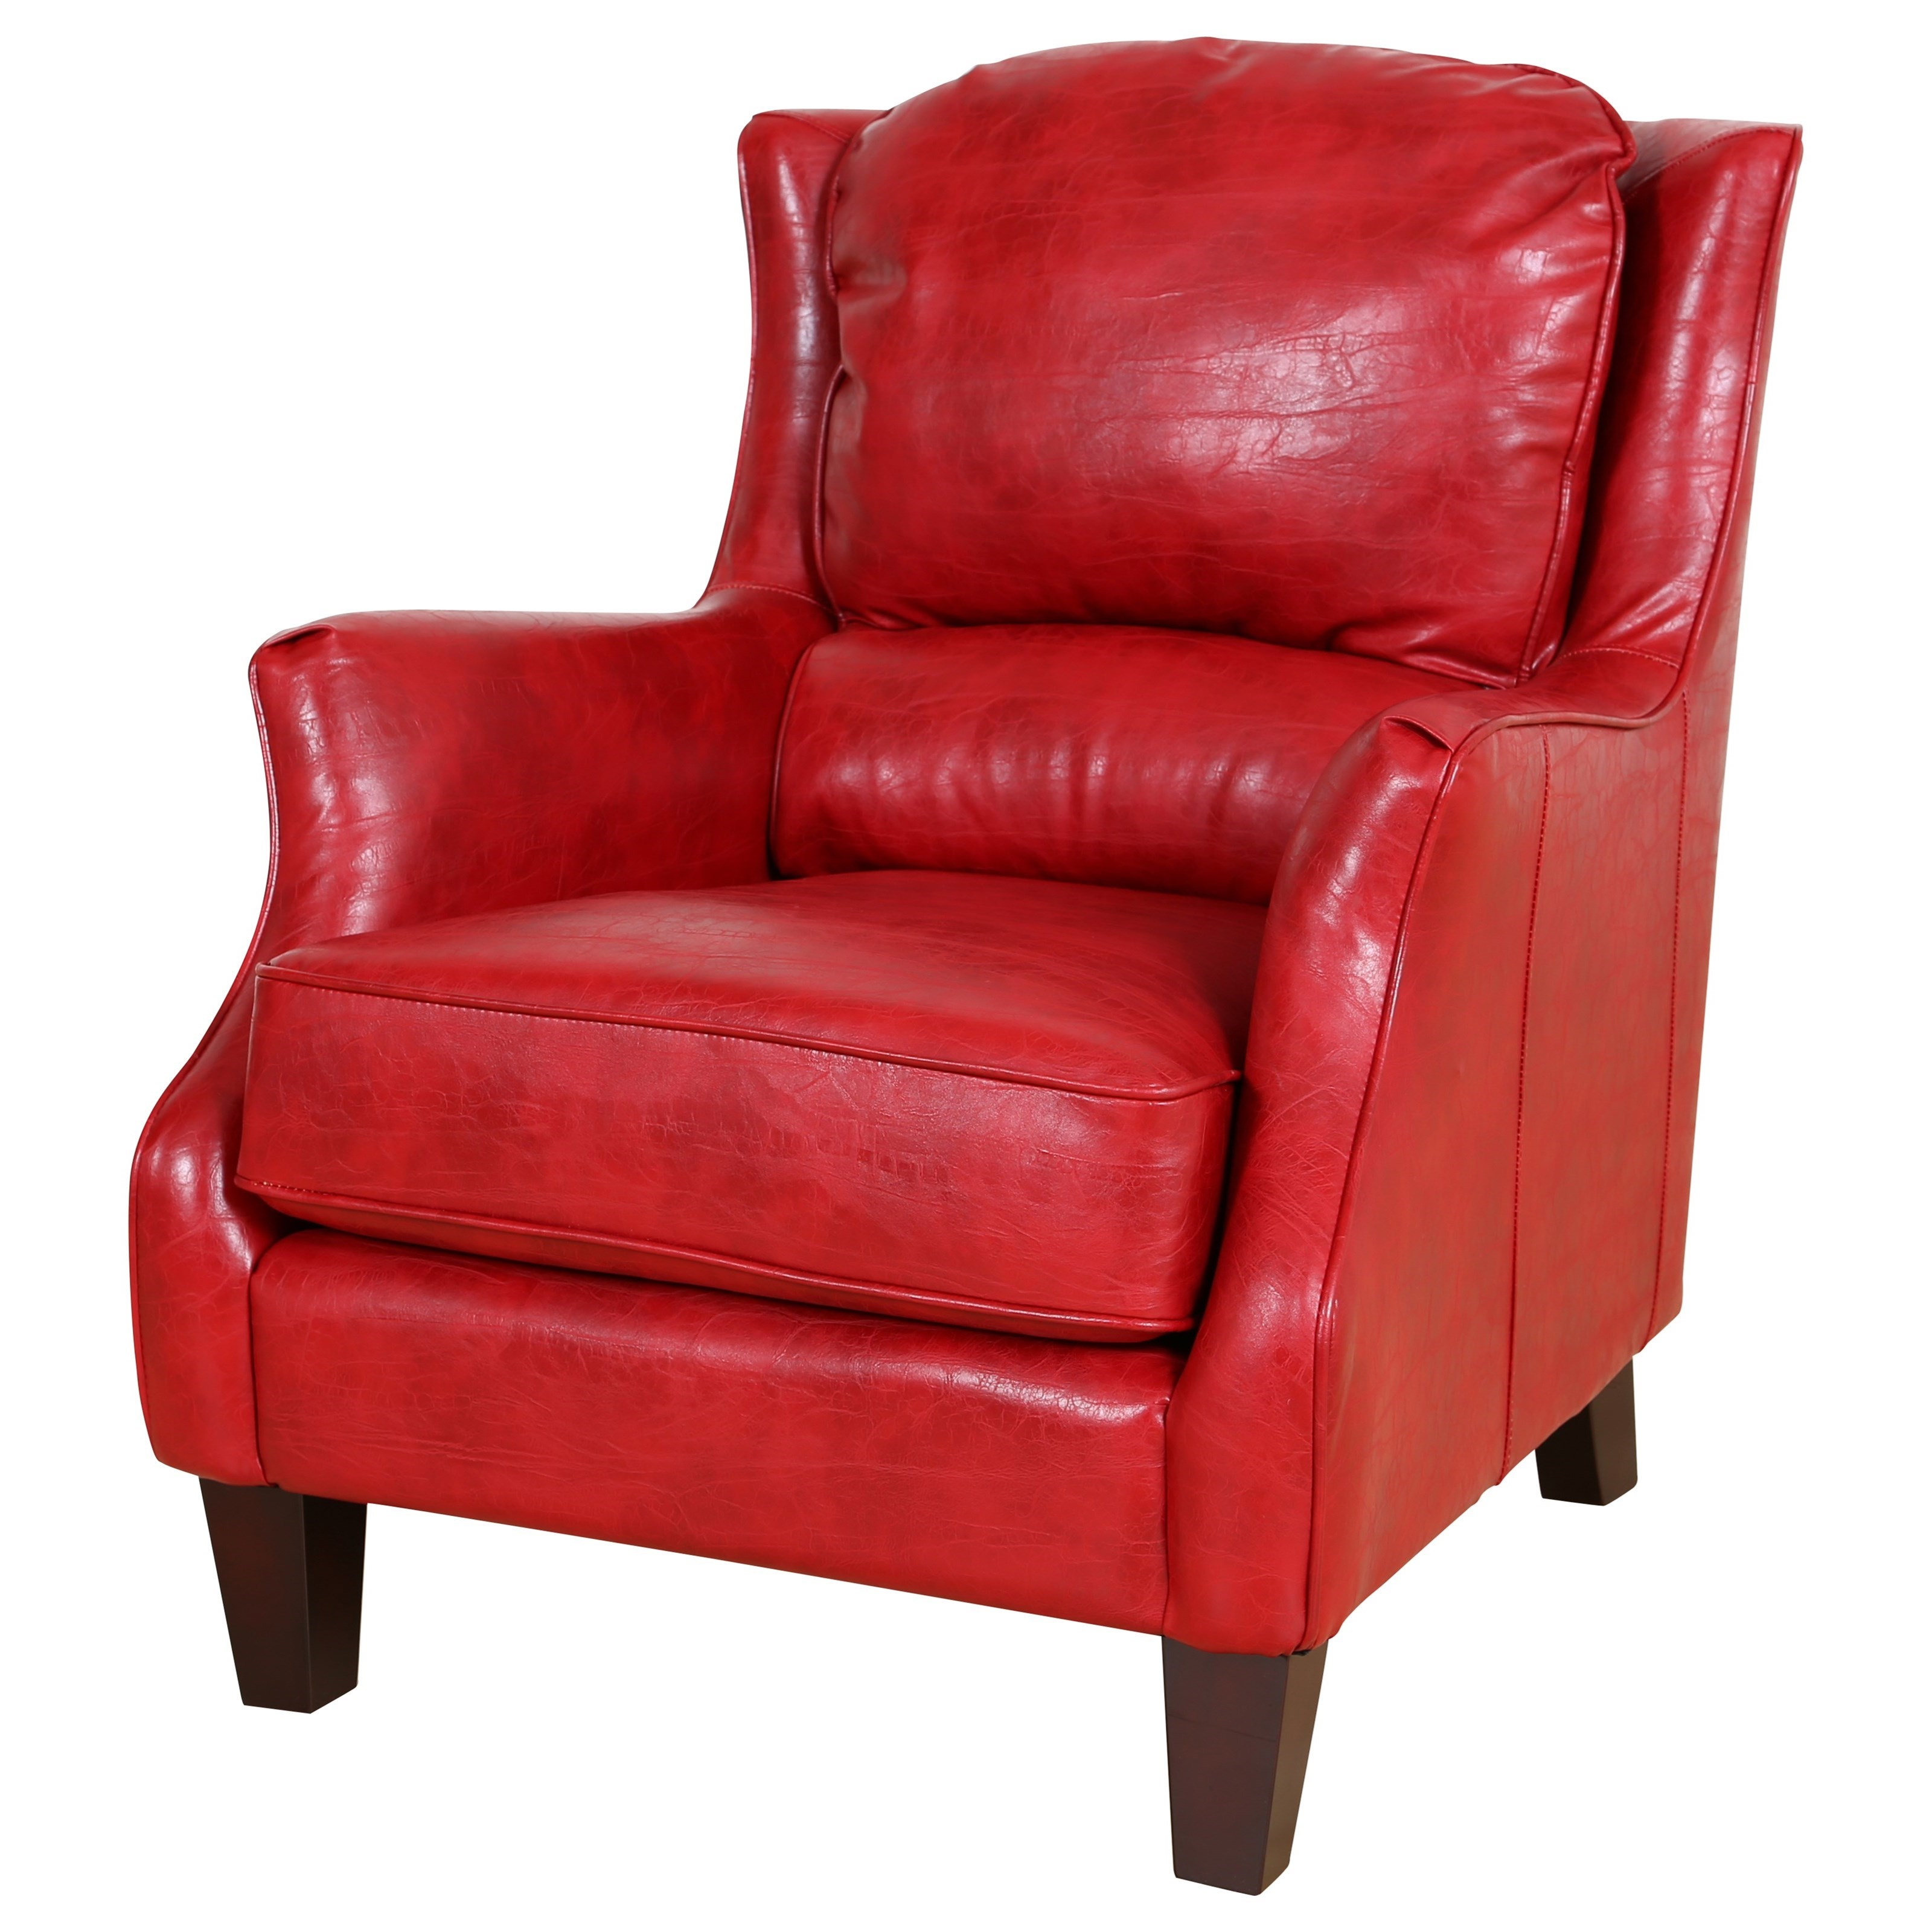 Garnett Wing Chair at Williams & Kay